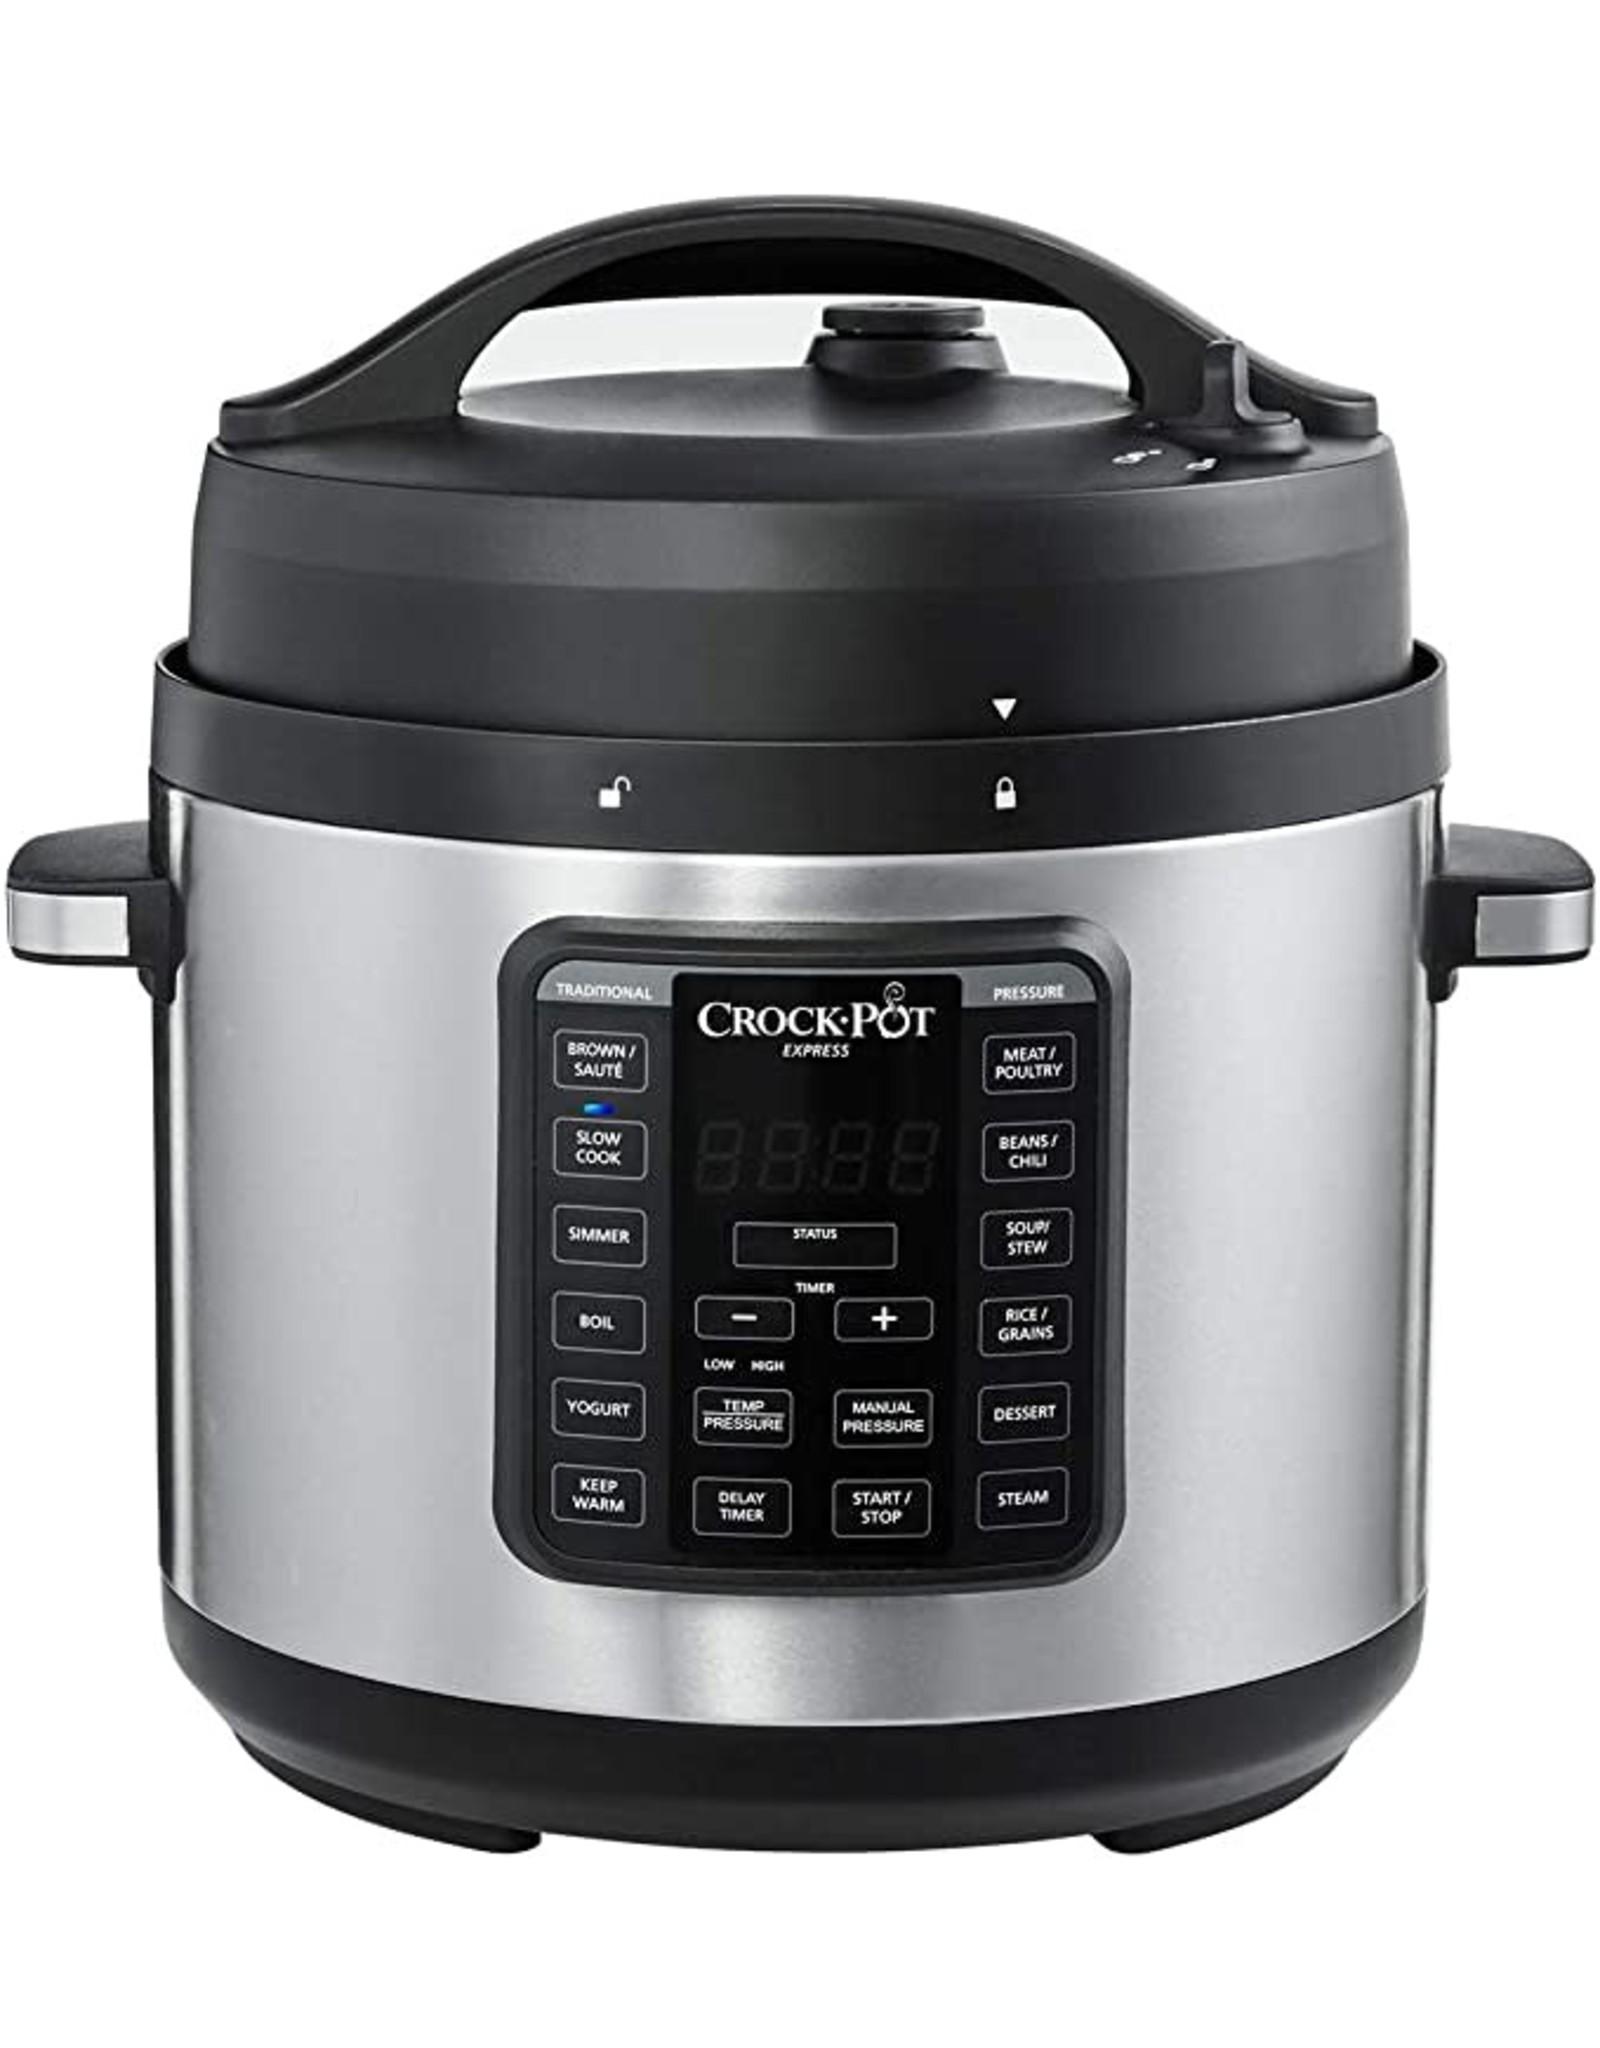 Crock-pot 2100467 Crock-Pot Express Easy Release   6 Quart Slow, Pressure, Multi Cooker, 6QT, Stainless Steel